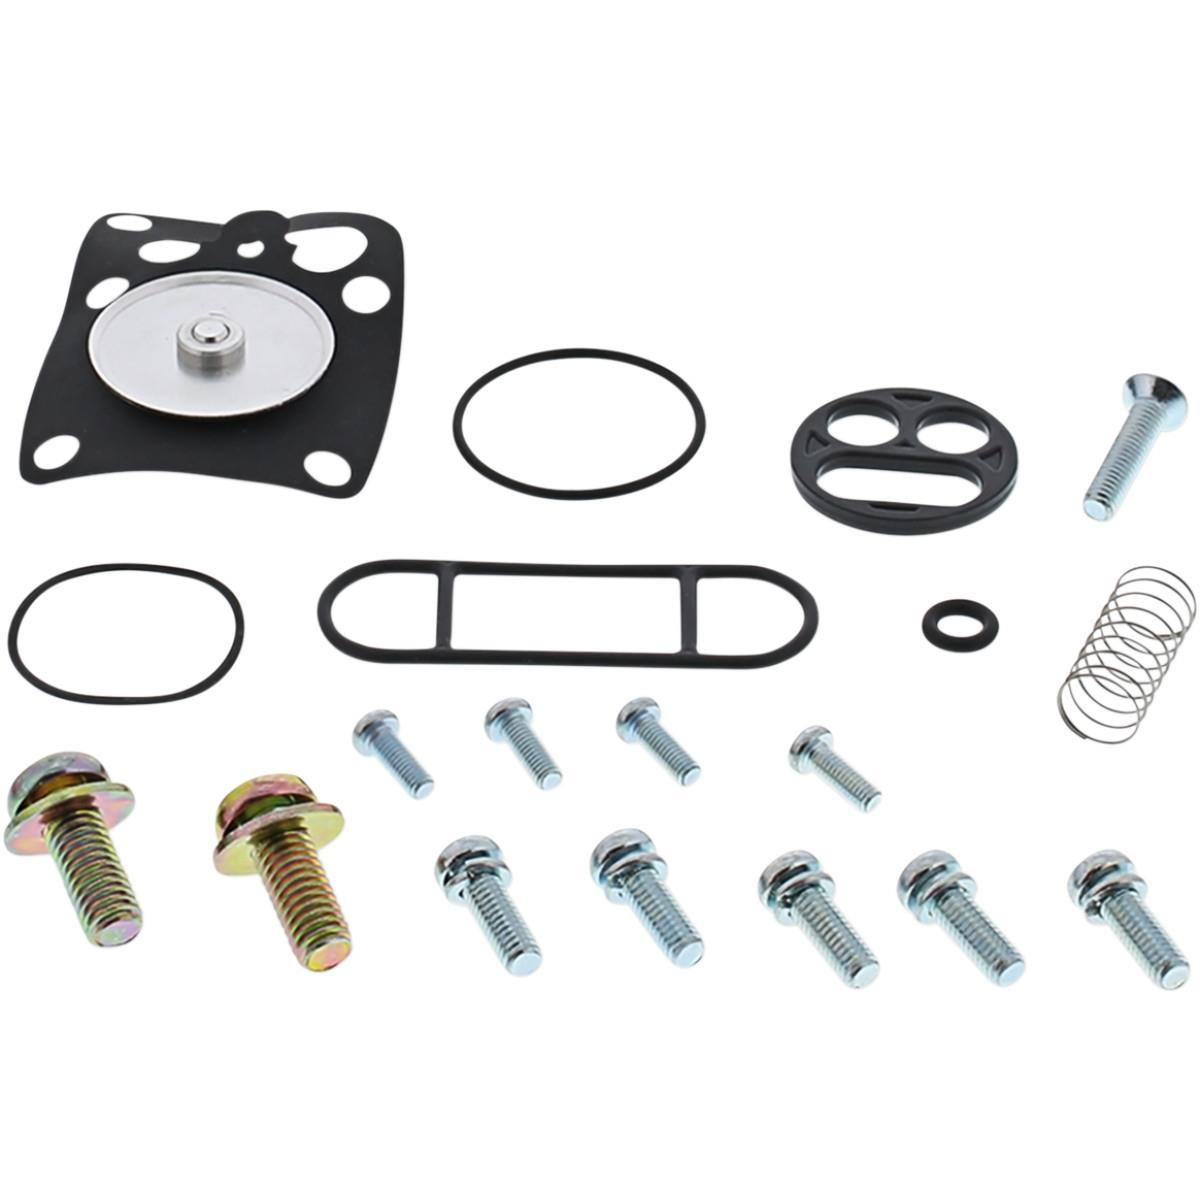 Moose Racing Fuel Petcock Rebuild Kits 0705-0399